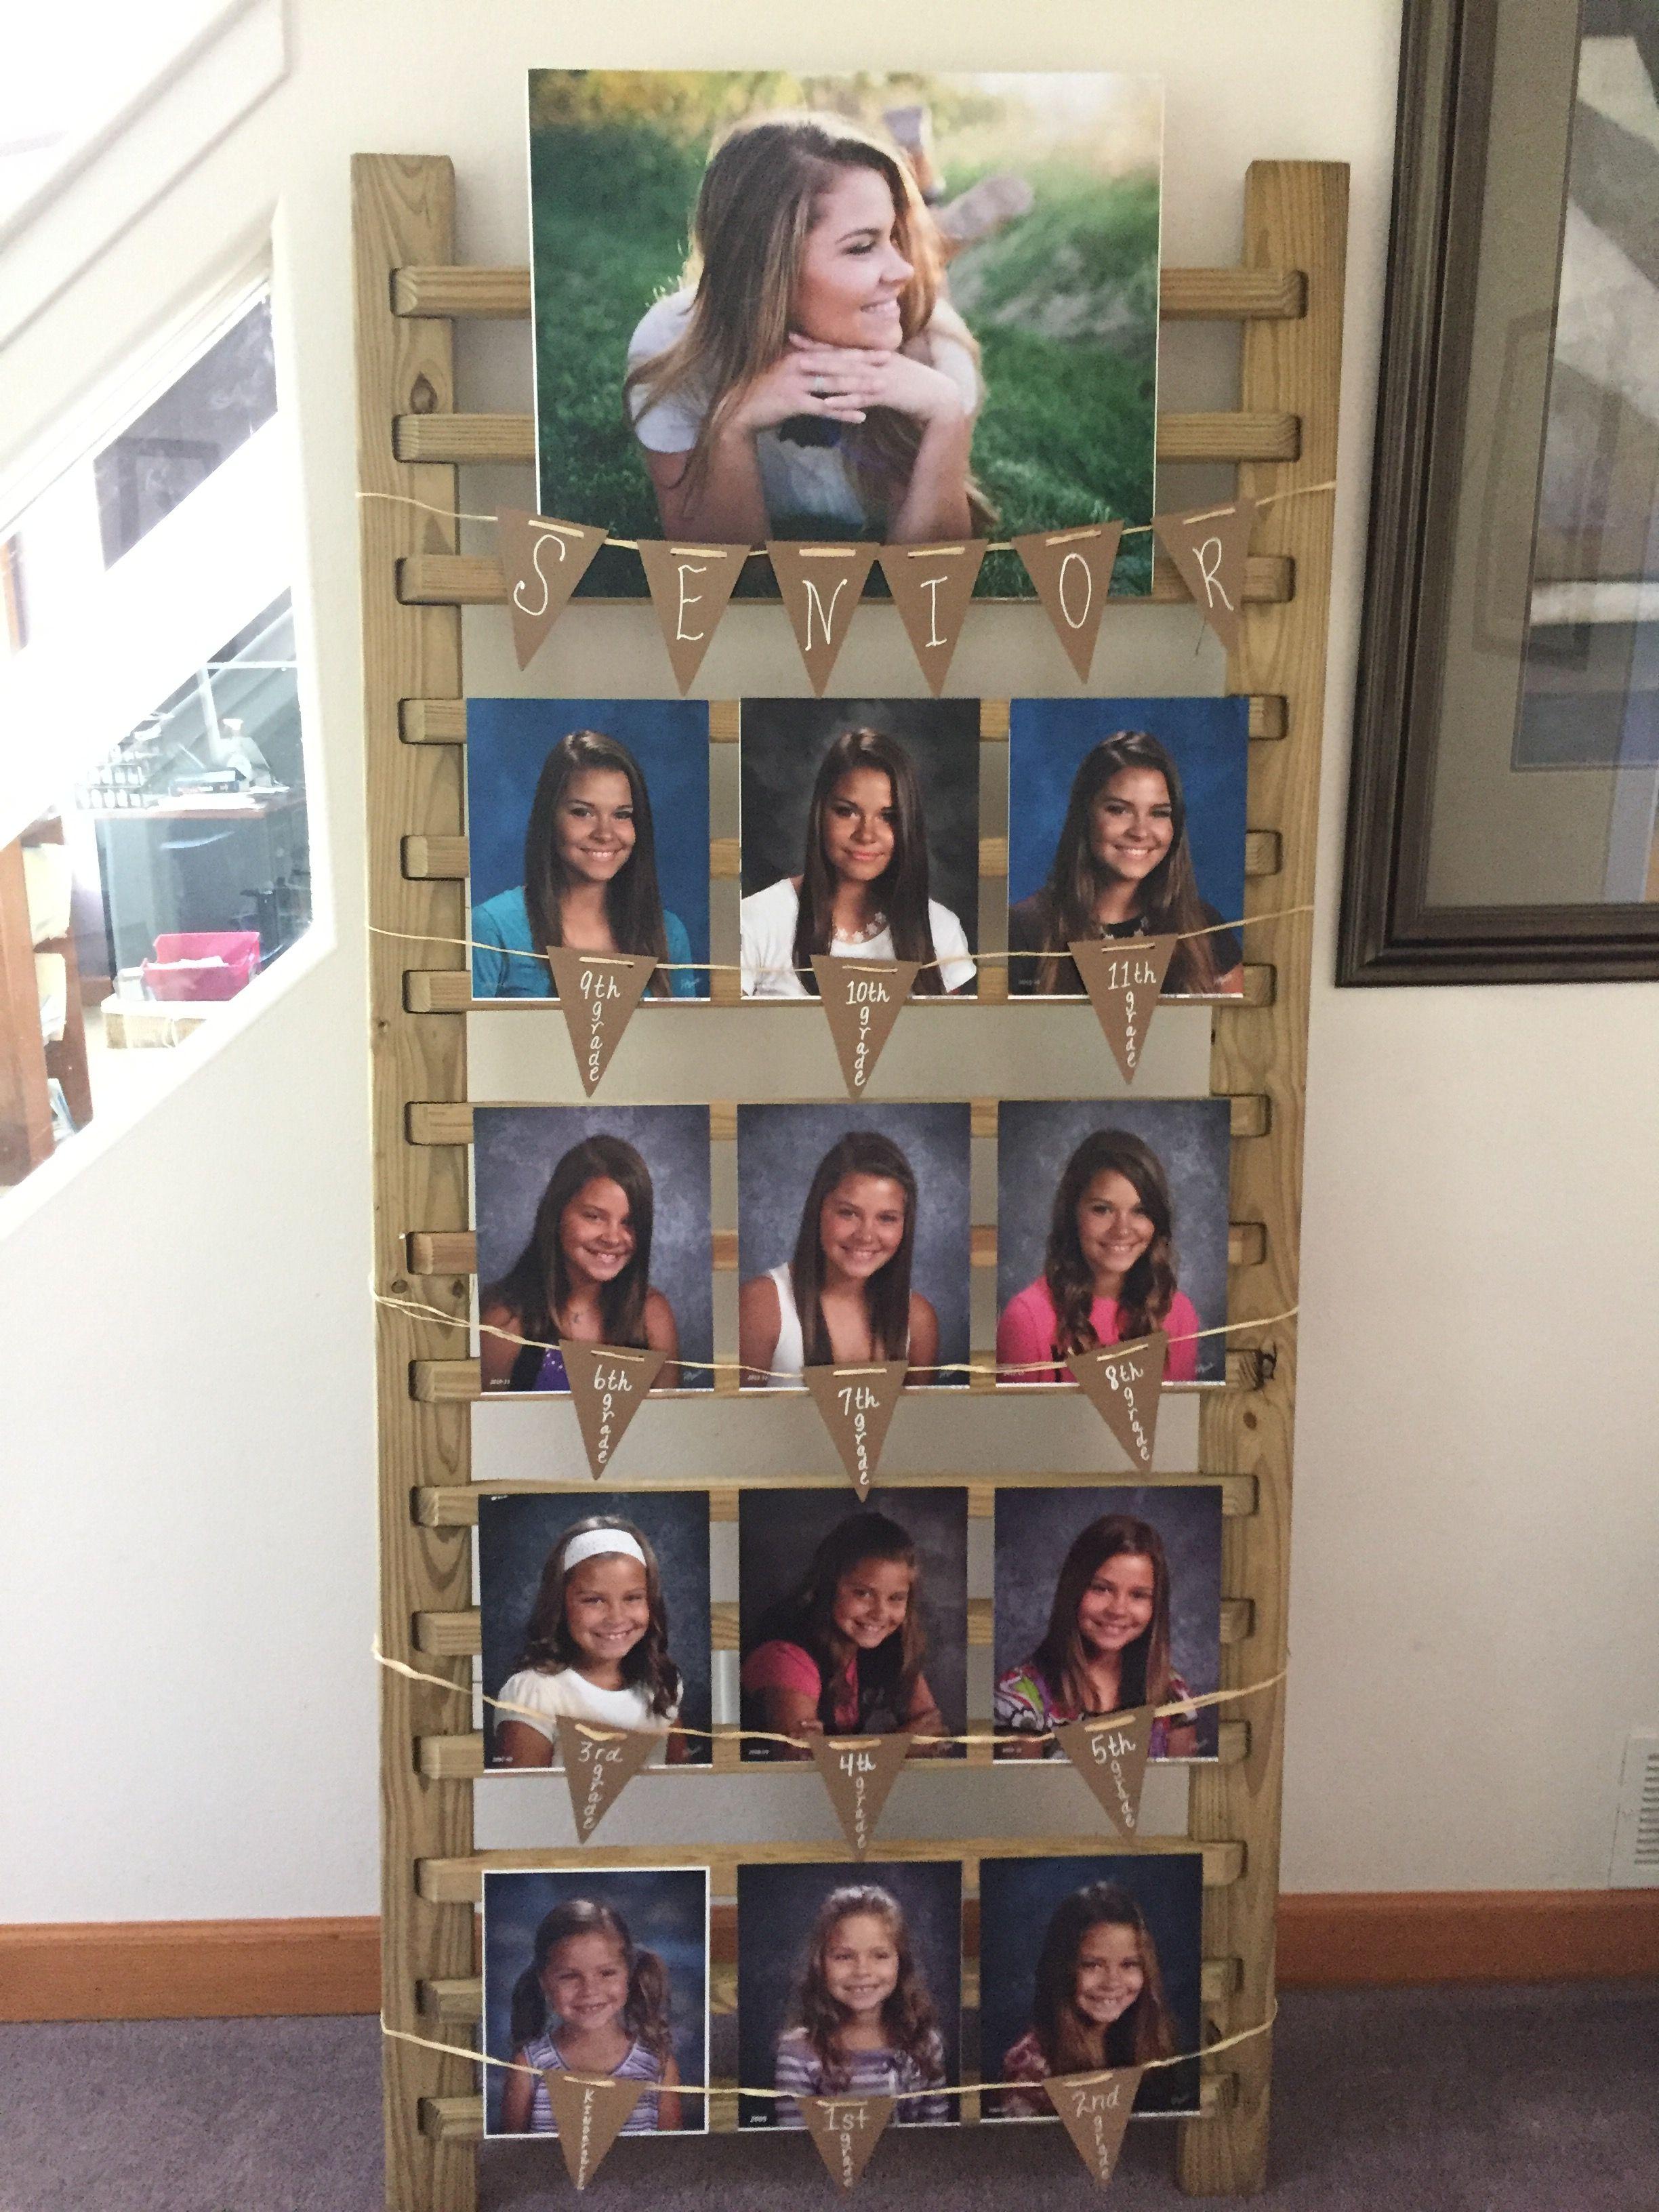 High school graduation photo idea using a wood railing